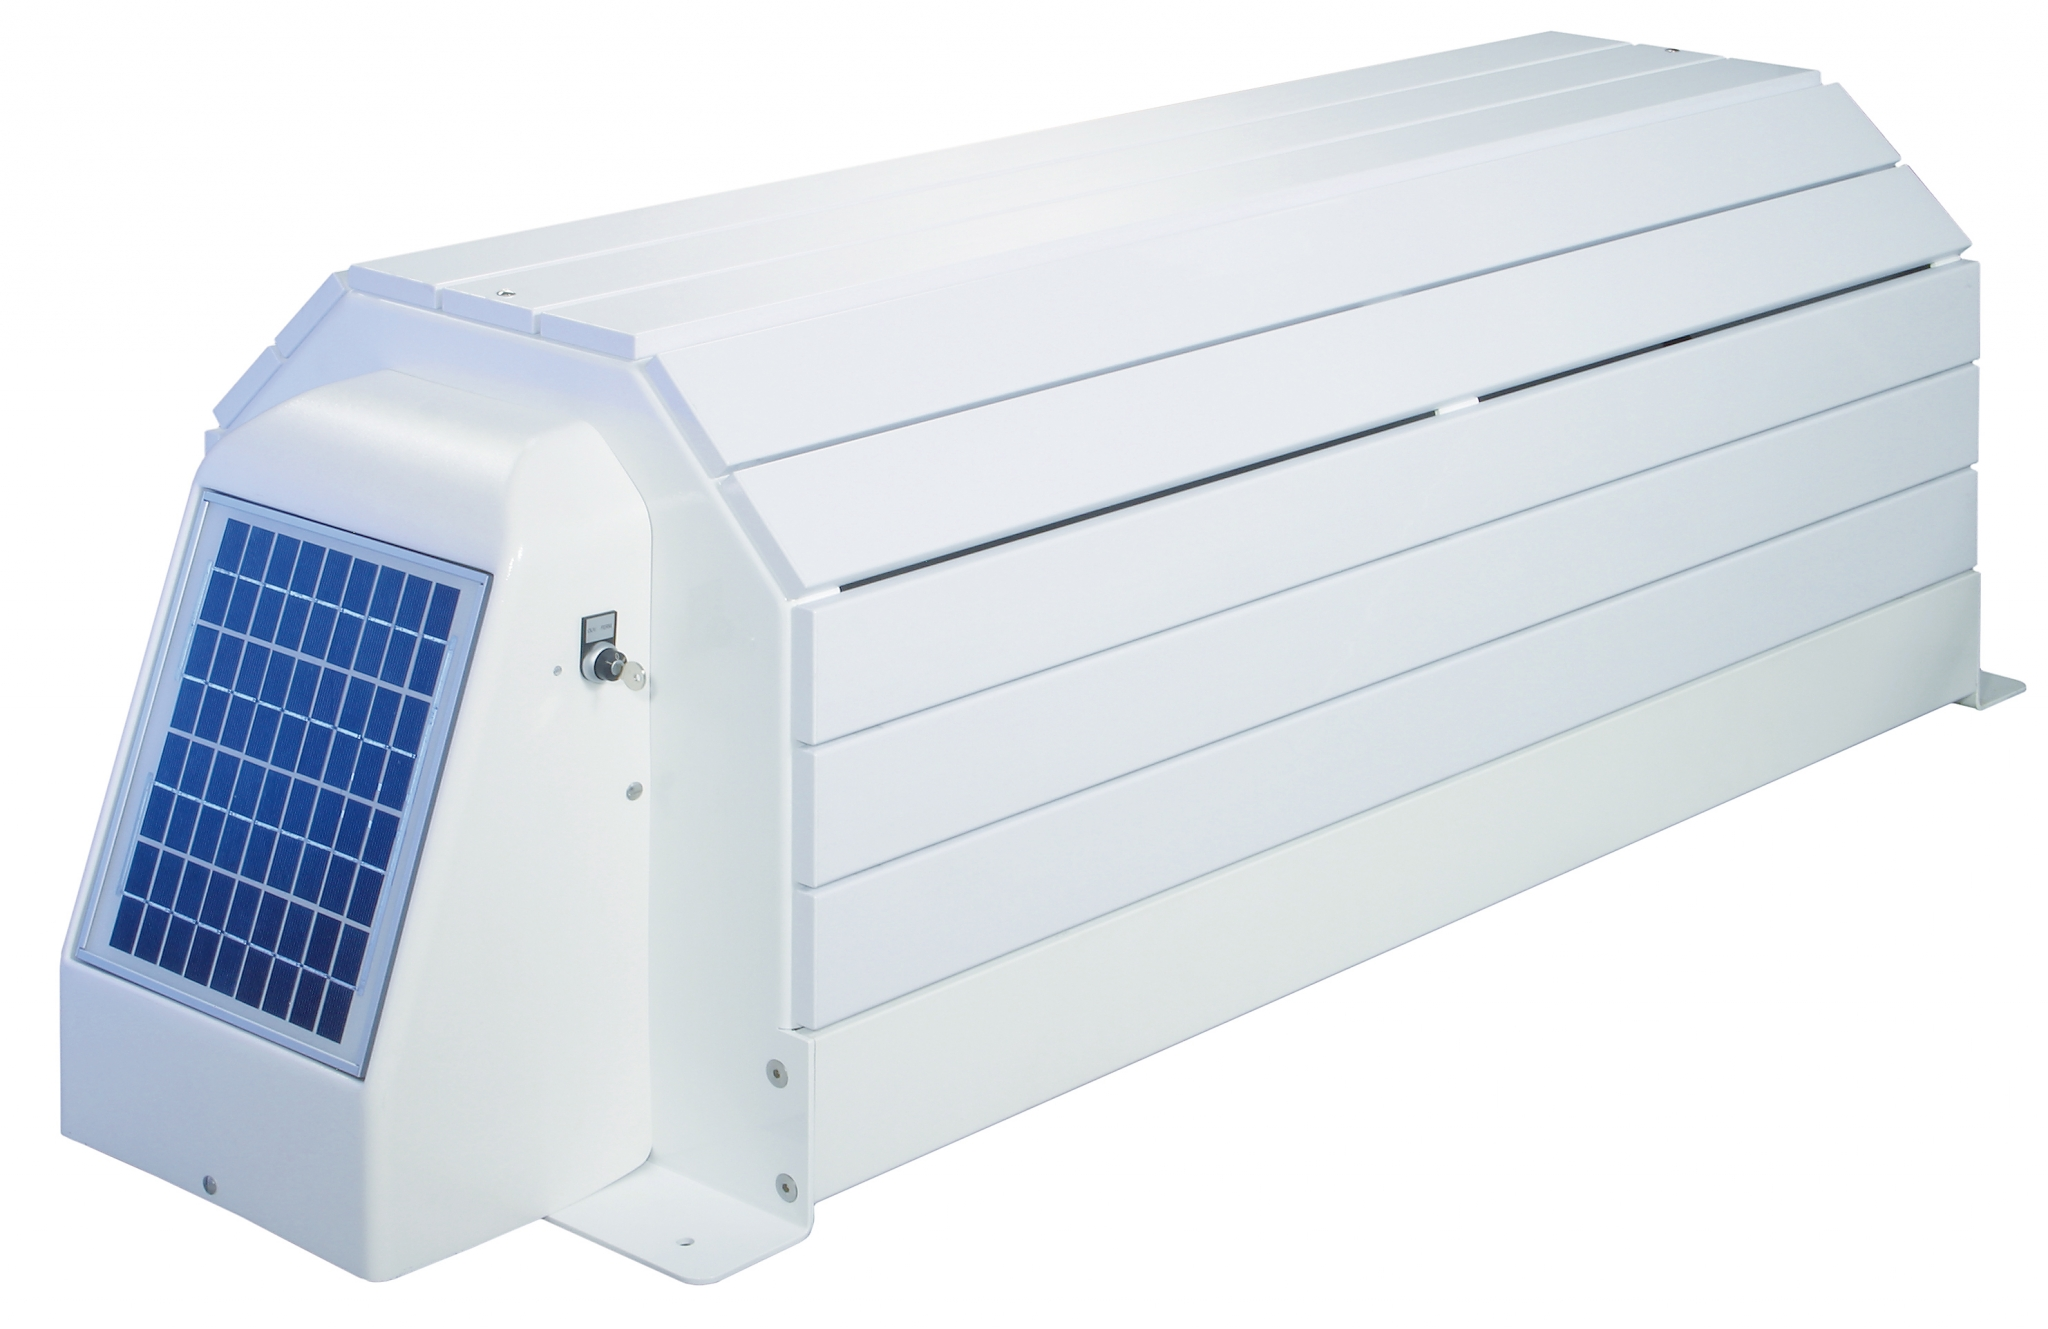 Cubierta automática solar para la piscina de astralpool en jujuju aquacenter benissa costablanca